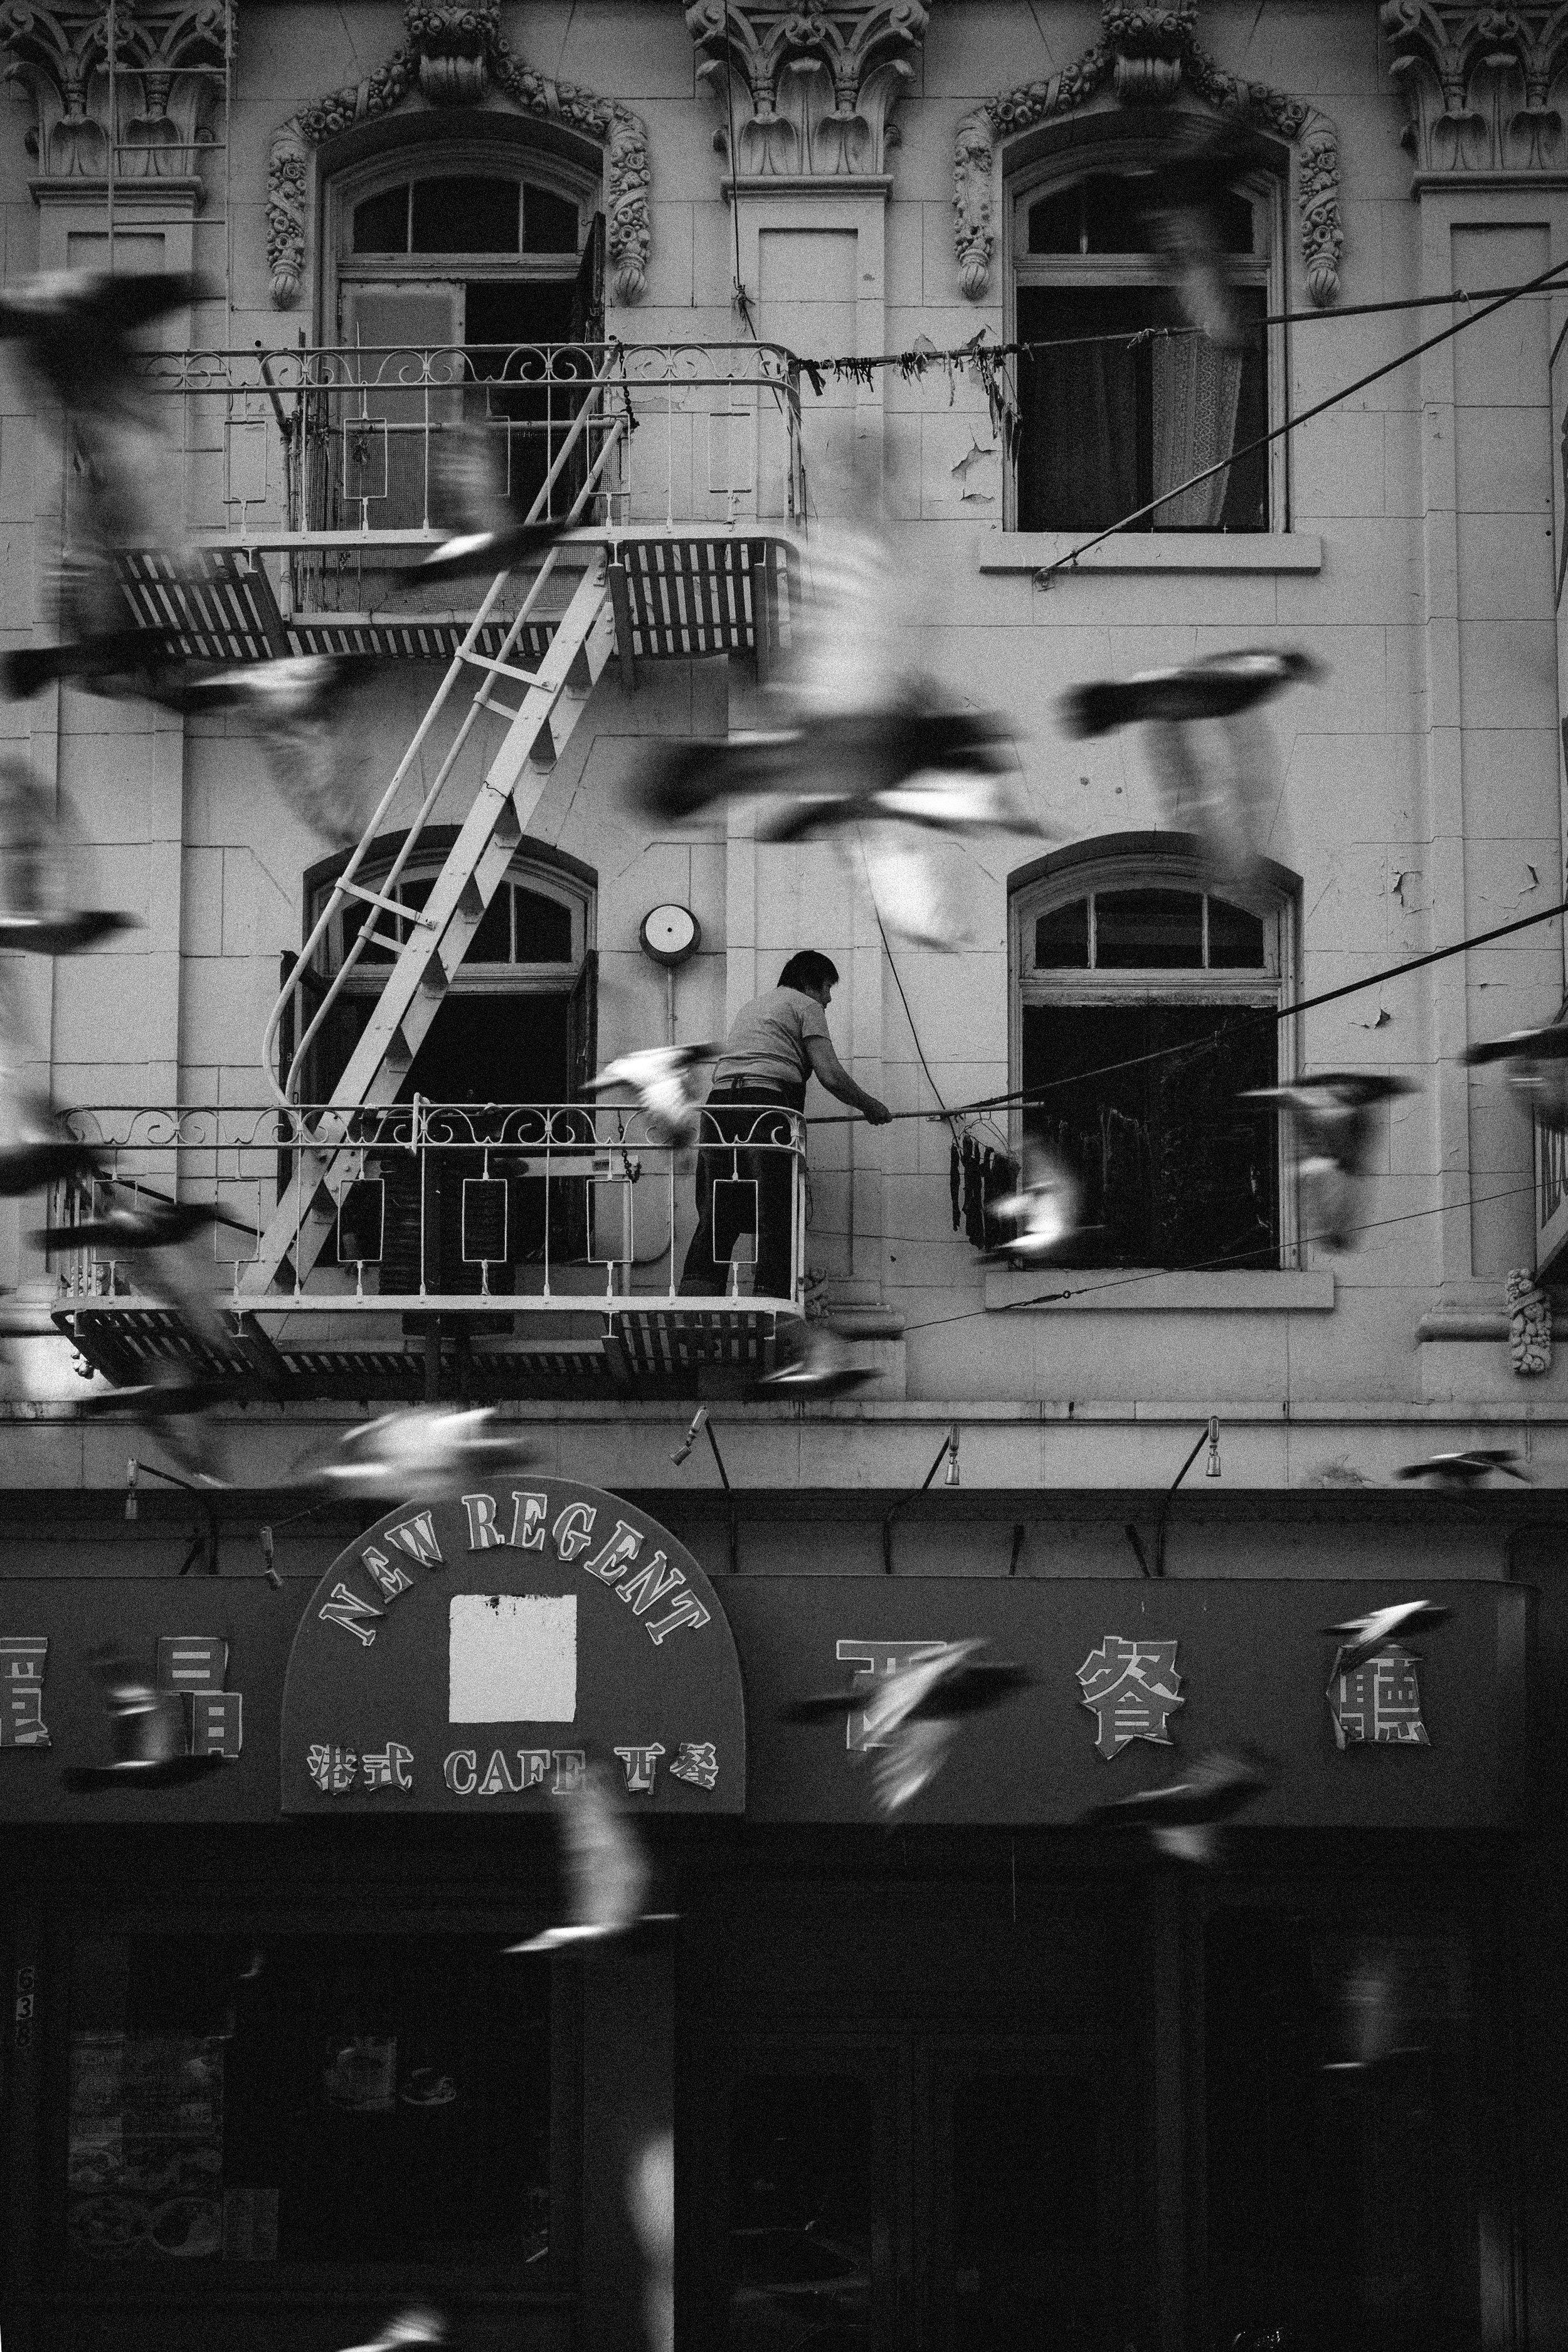 chris-wong-chinatown-4.jpg